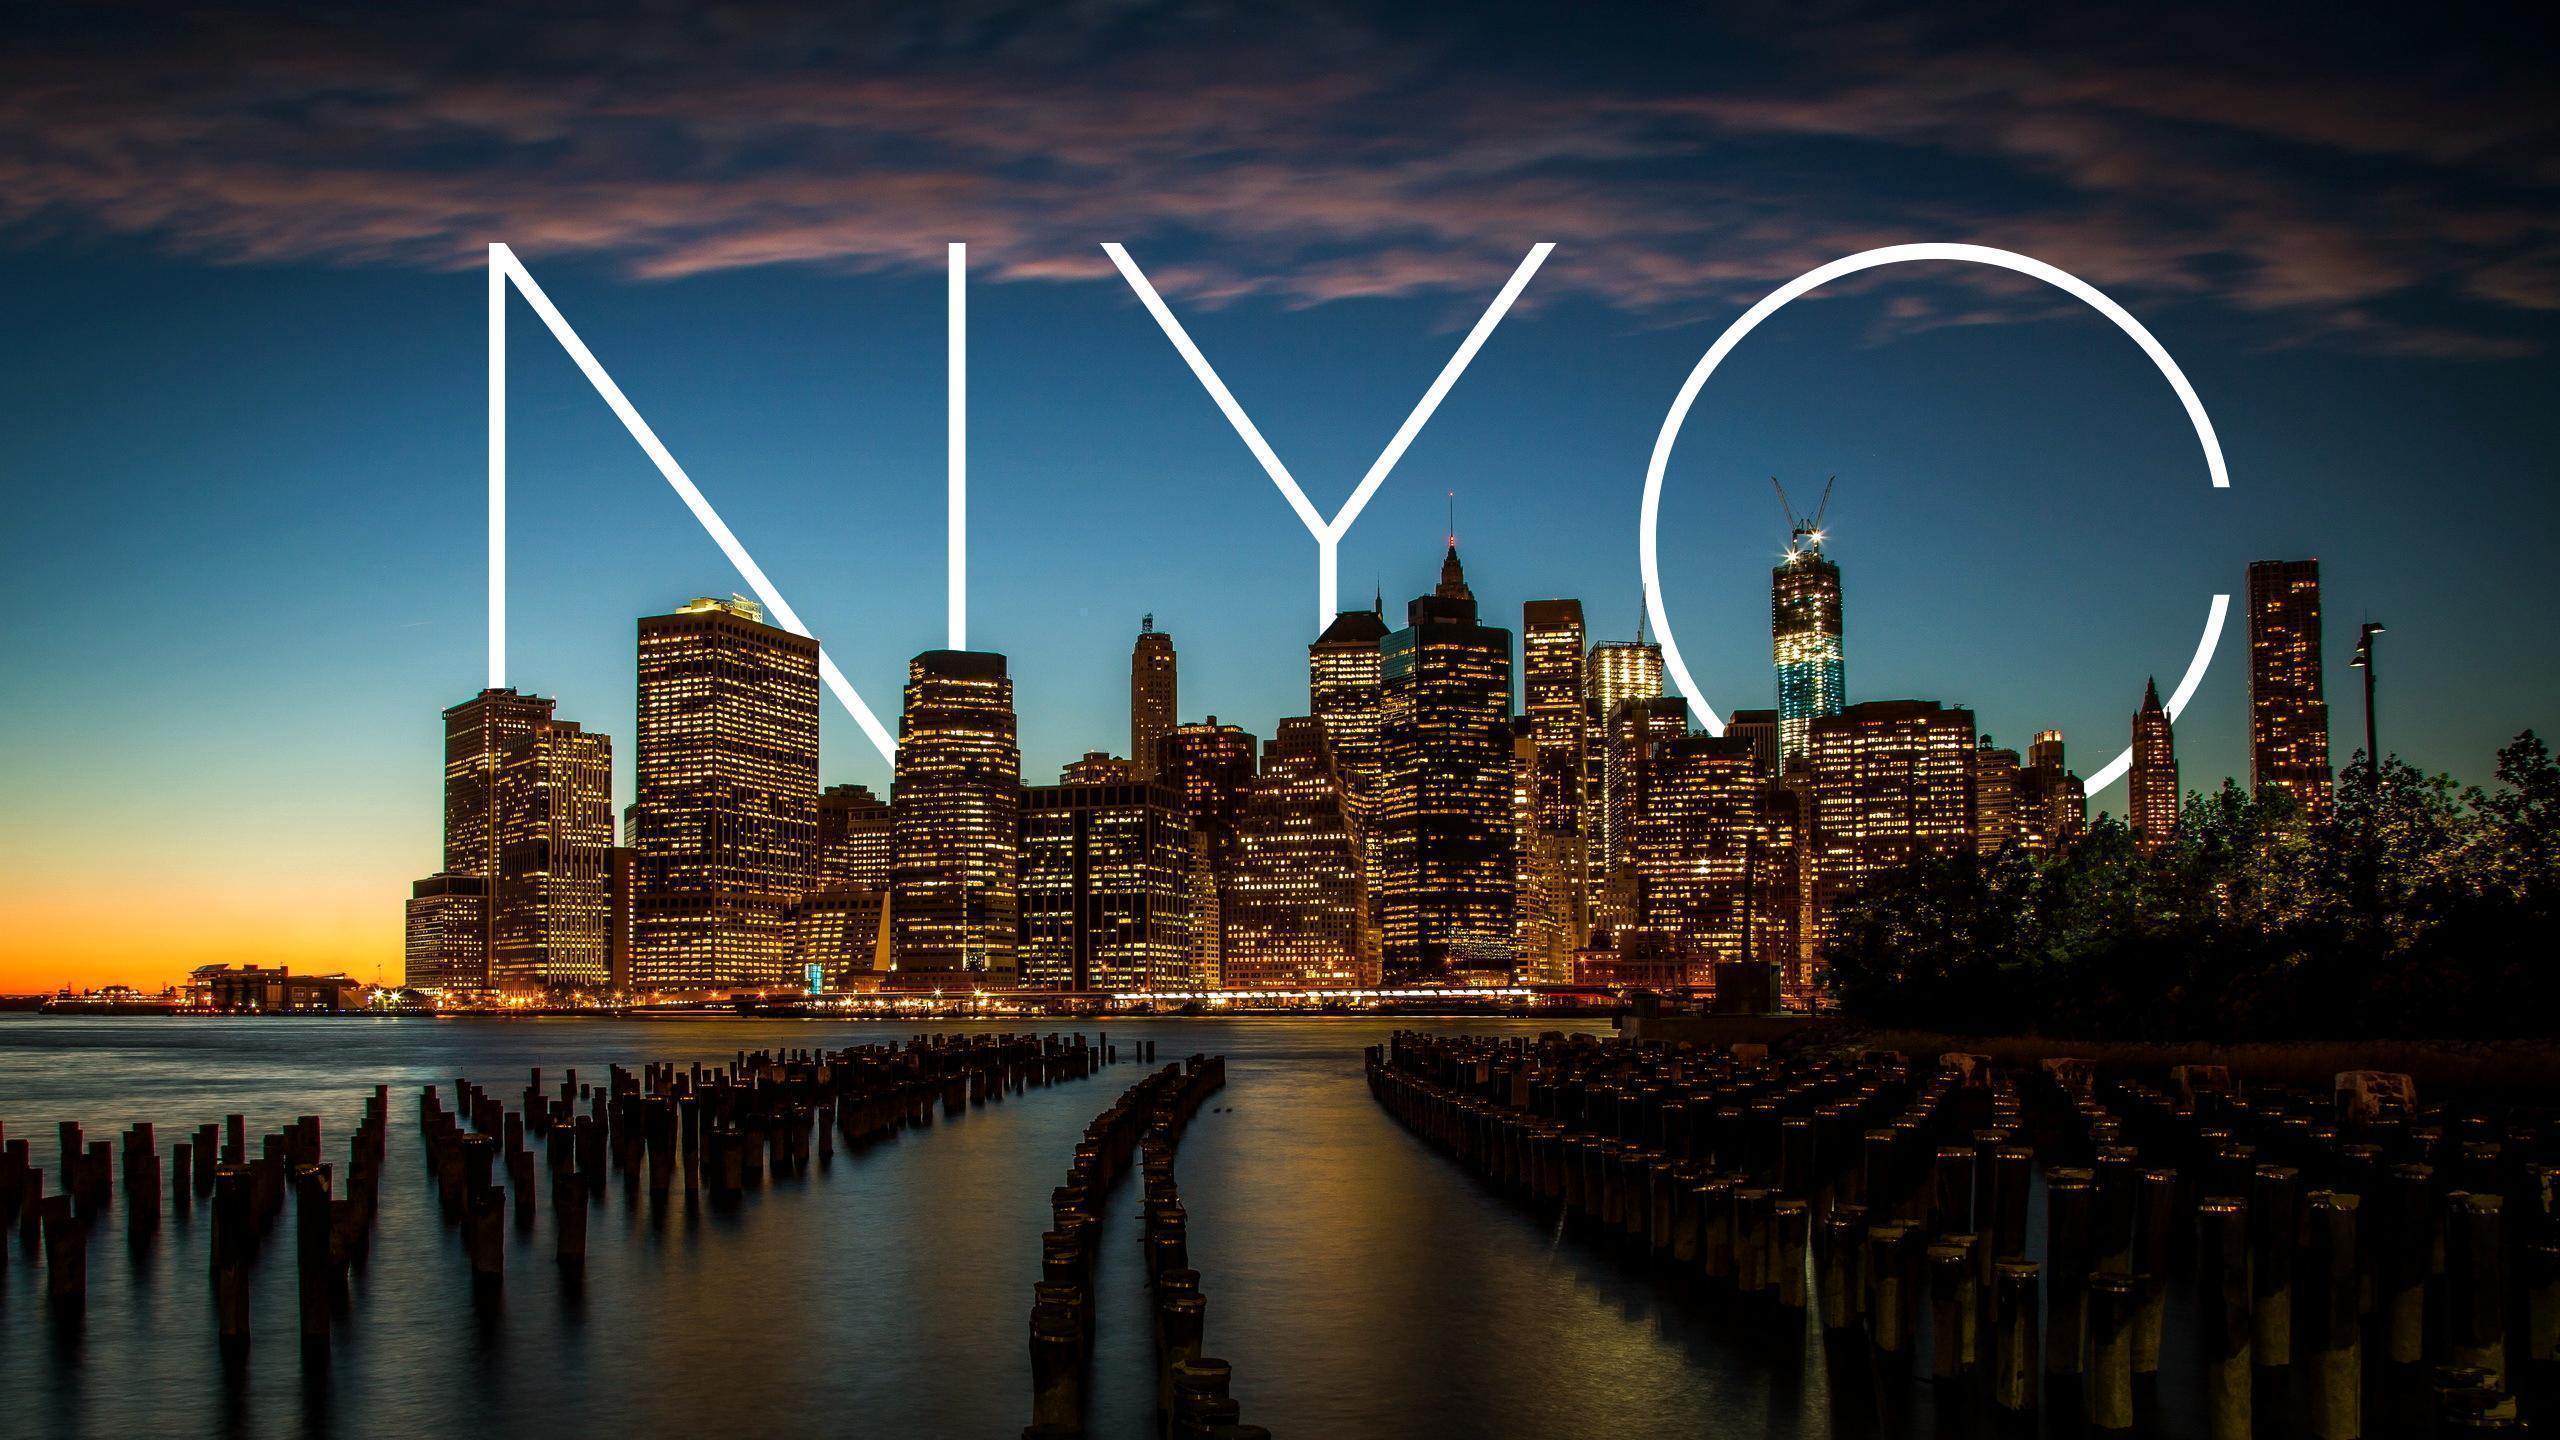 Wallpapers New York City 2560x1440